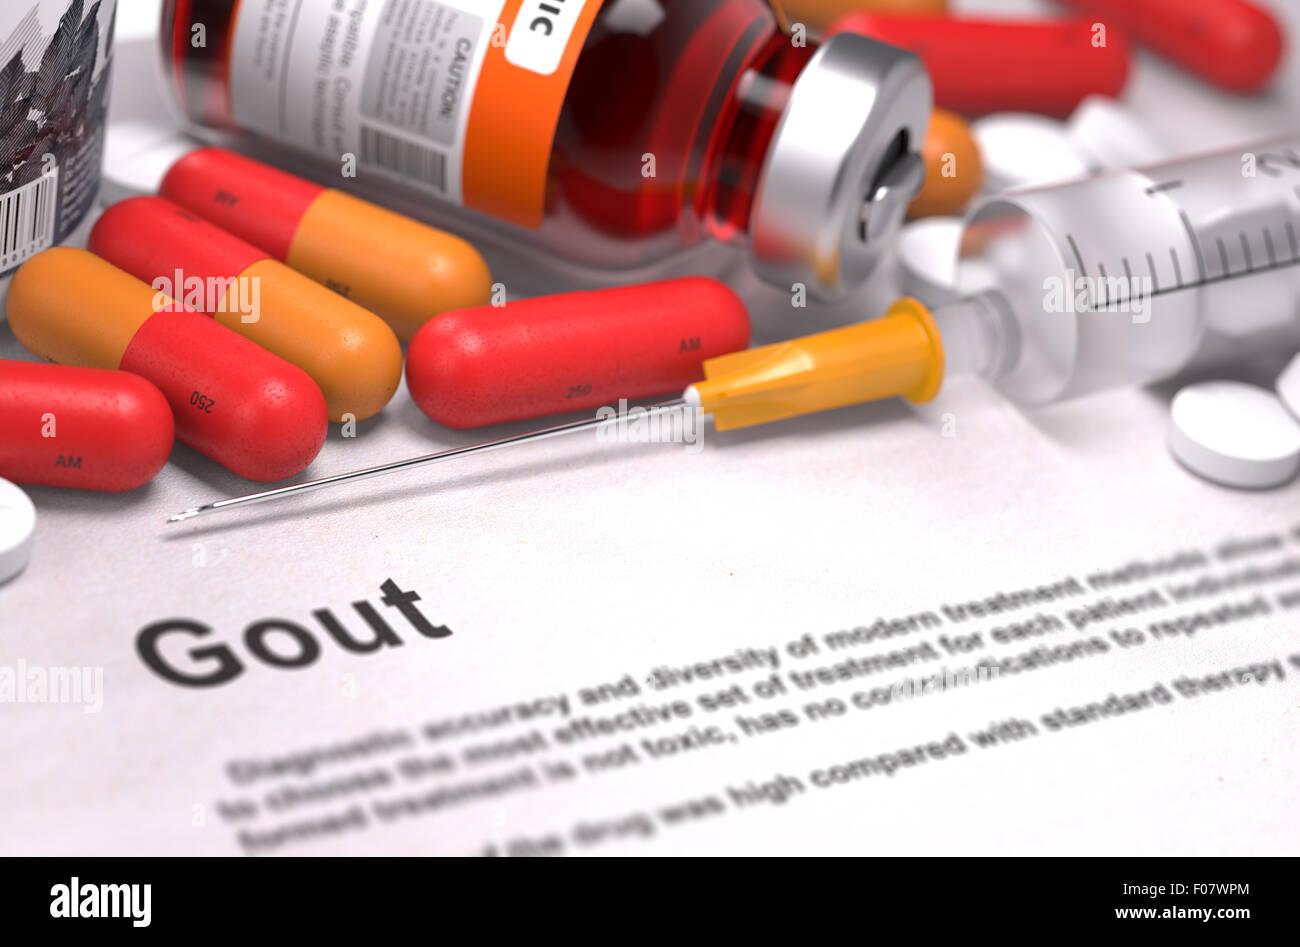 Diagnosis - Gout. Medical Concept. - Stock Image